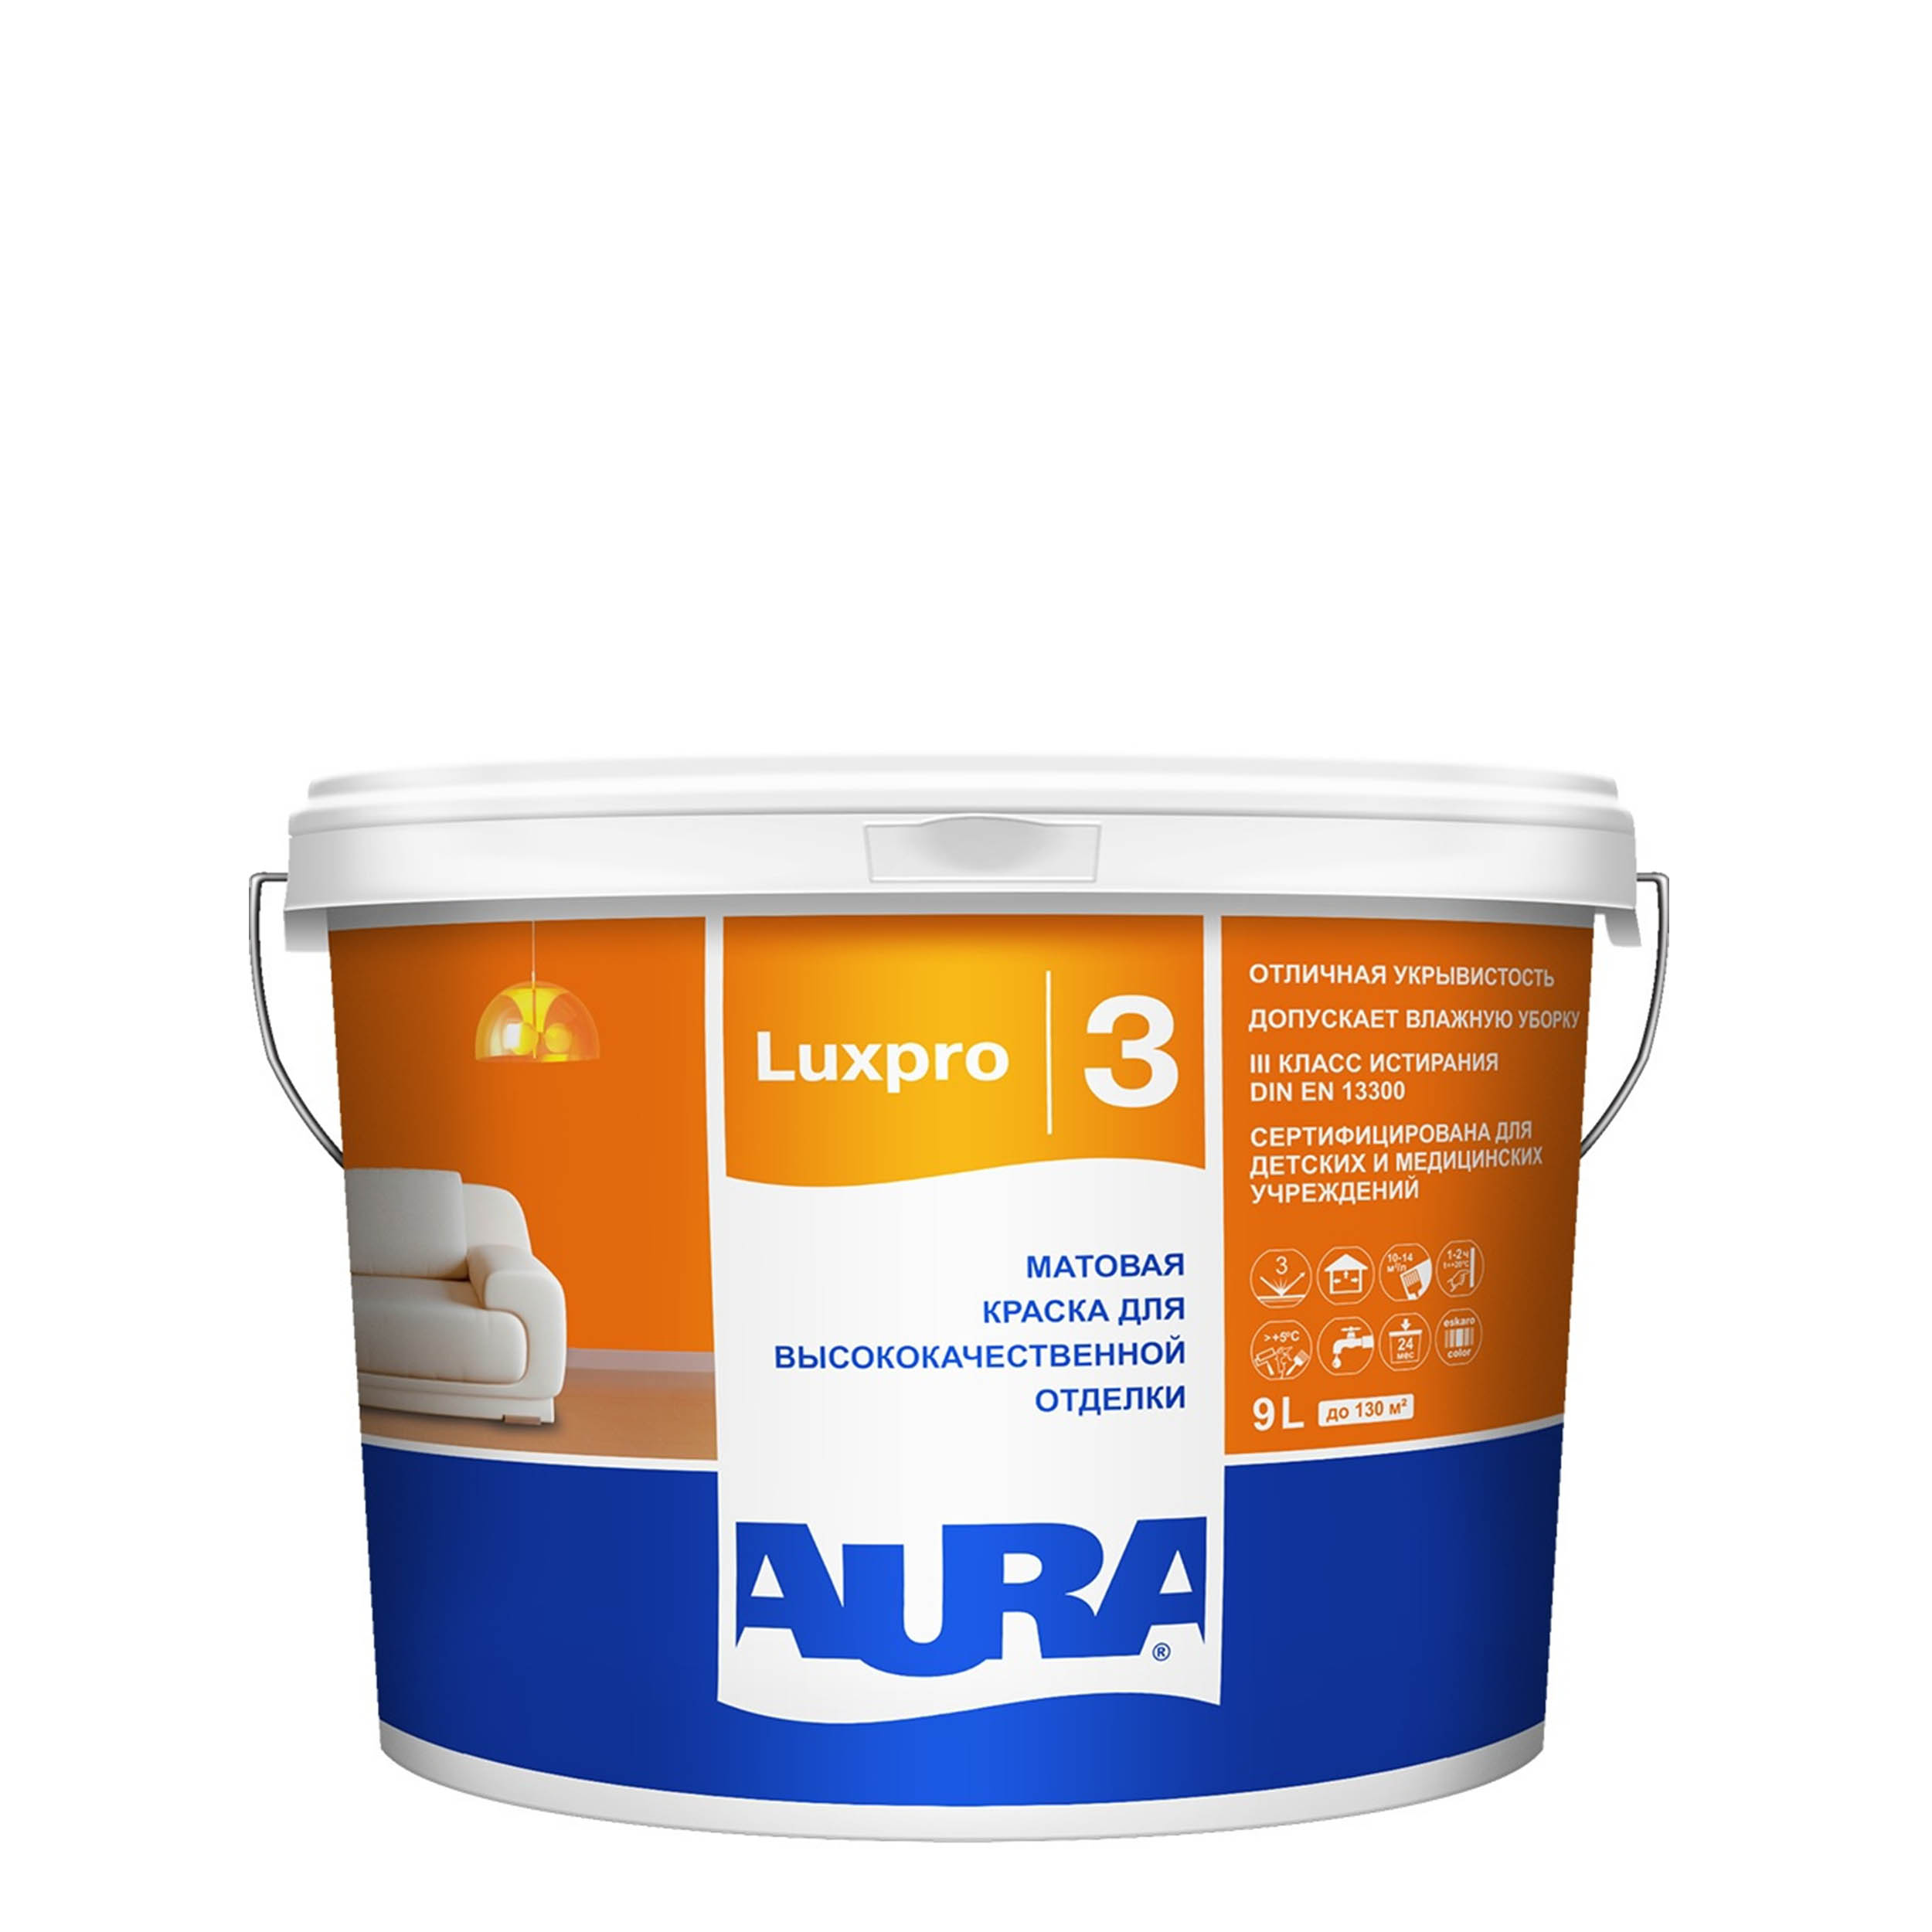 Фото 4 - Краска интерьерная, Aura LuxPRO 3, RAL 6015, 11 кг.